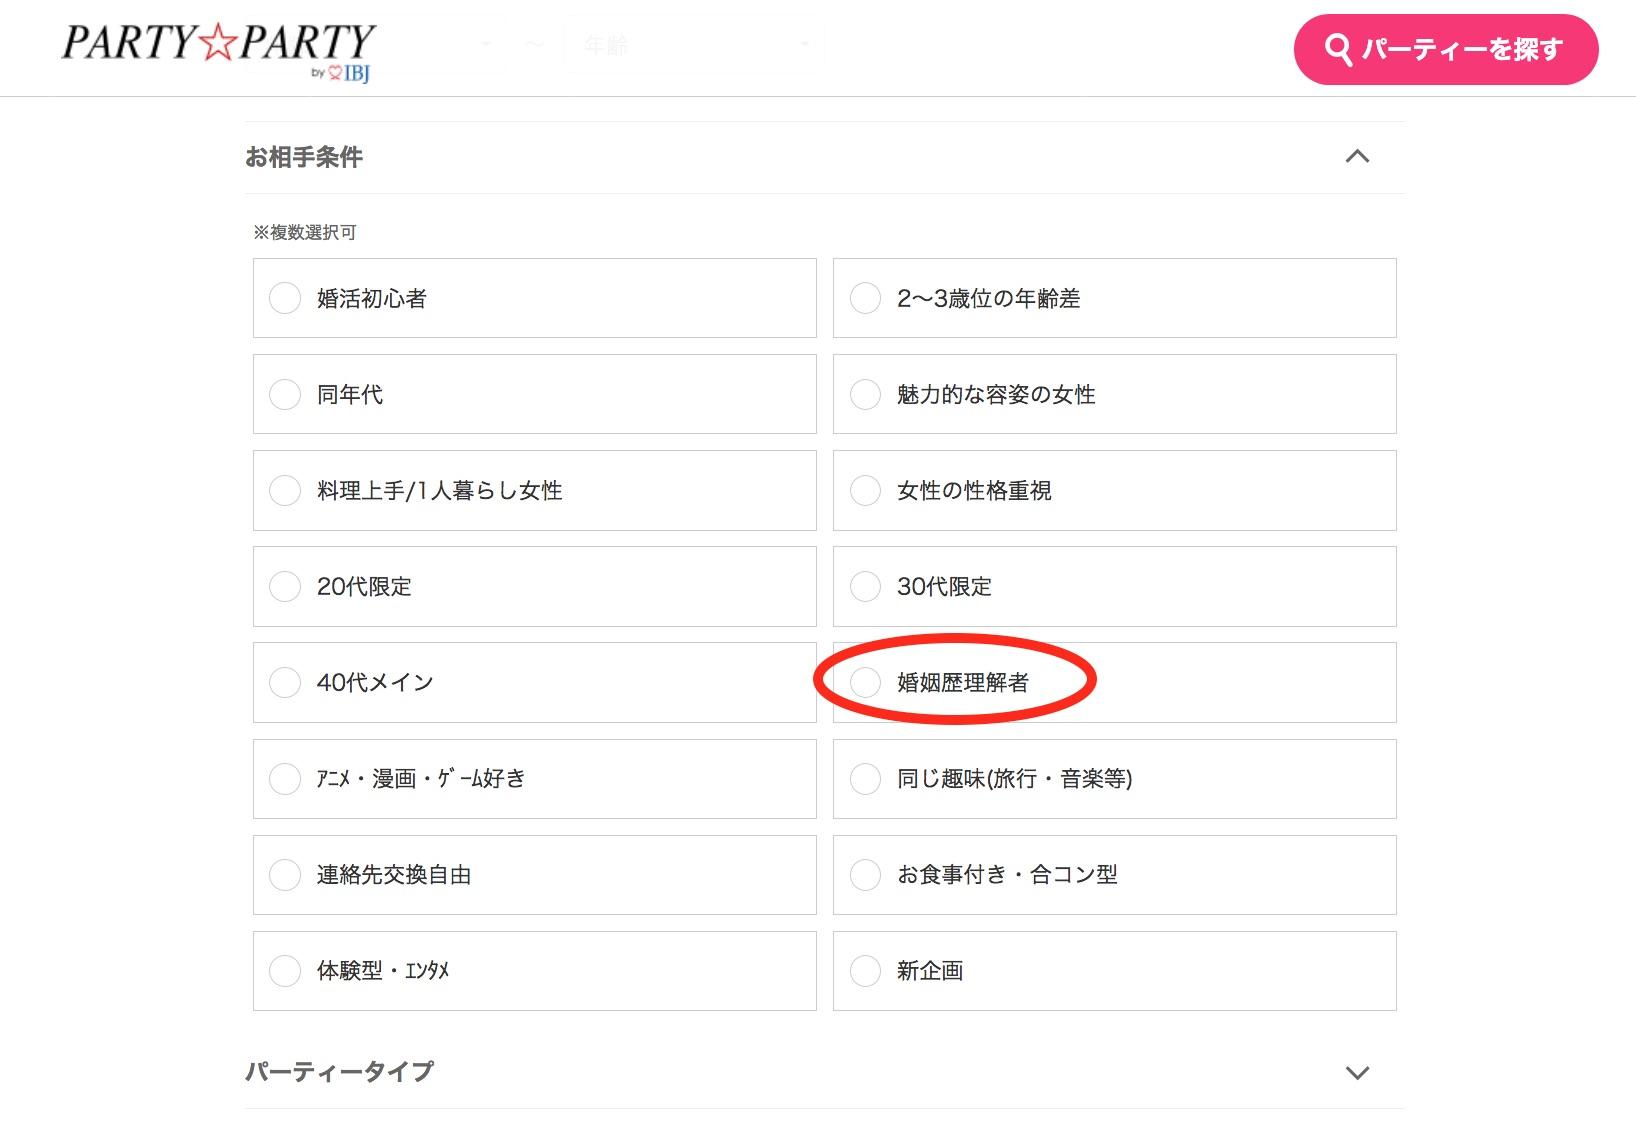 PARTY☆PARTYが開催するパーティーへの「申し込み方法」-2